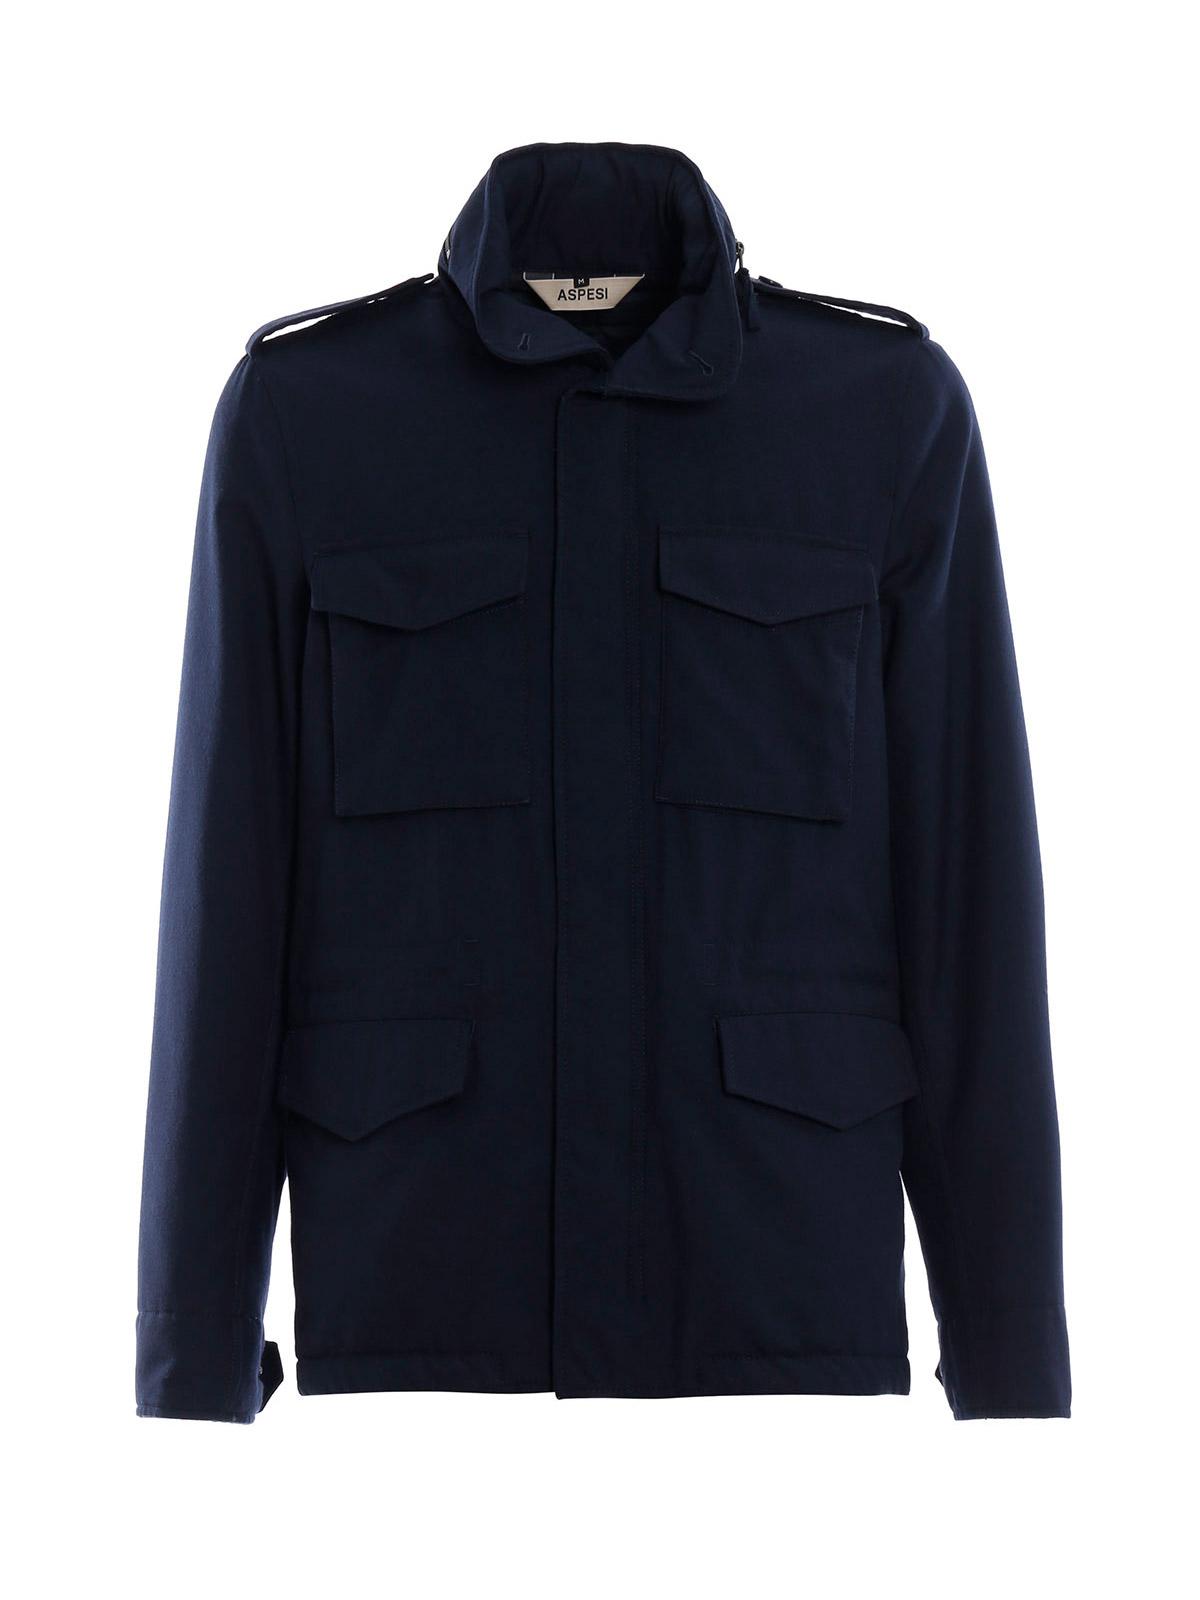 Picture of ASPESI | Men's Minifield Jacket